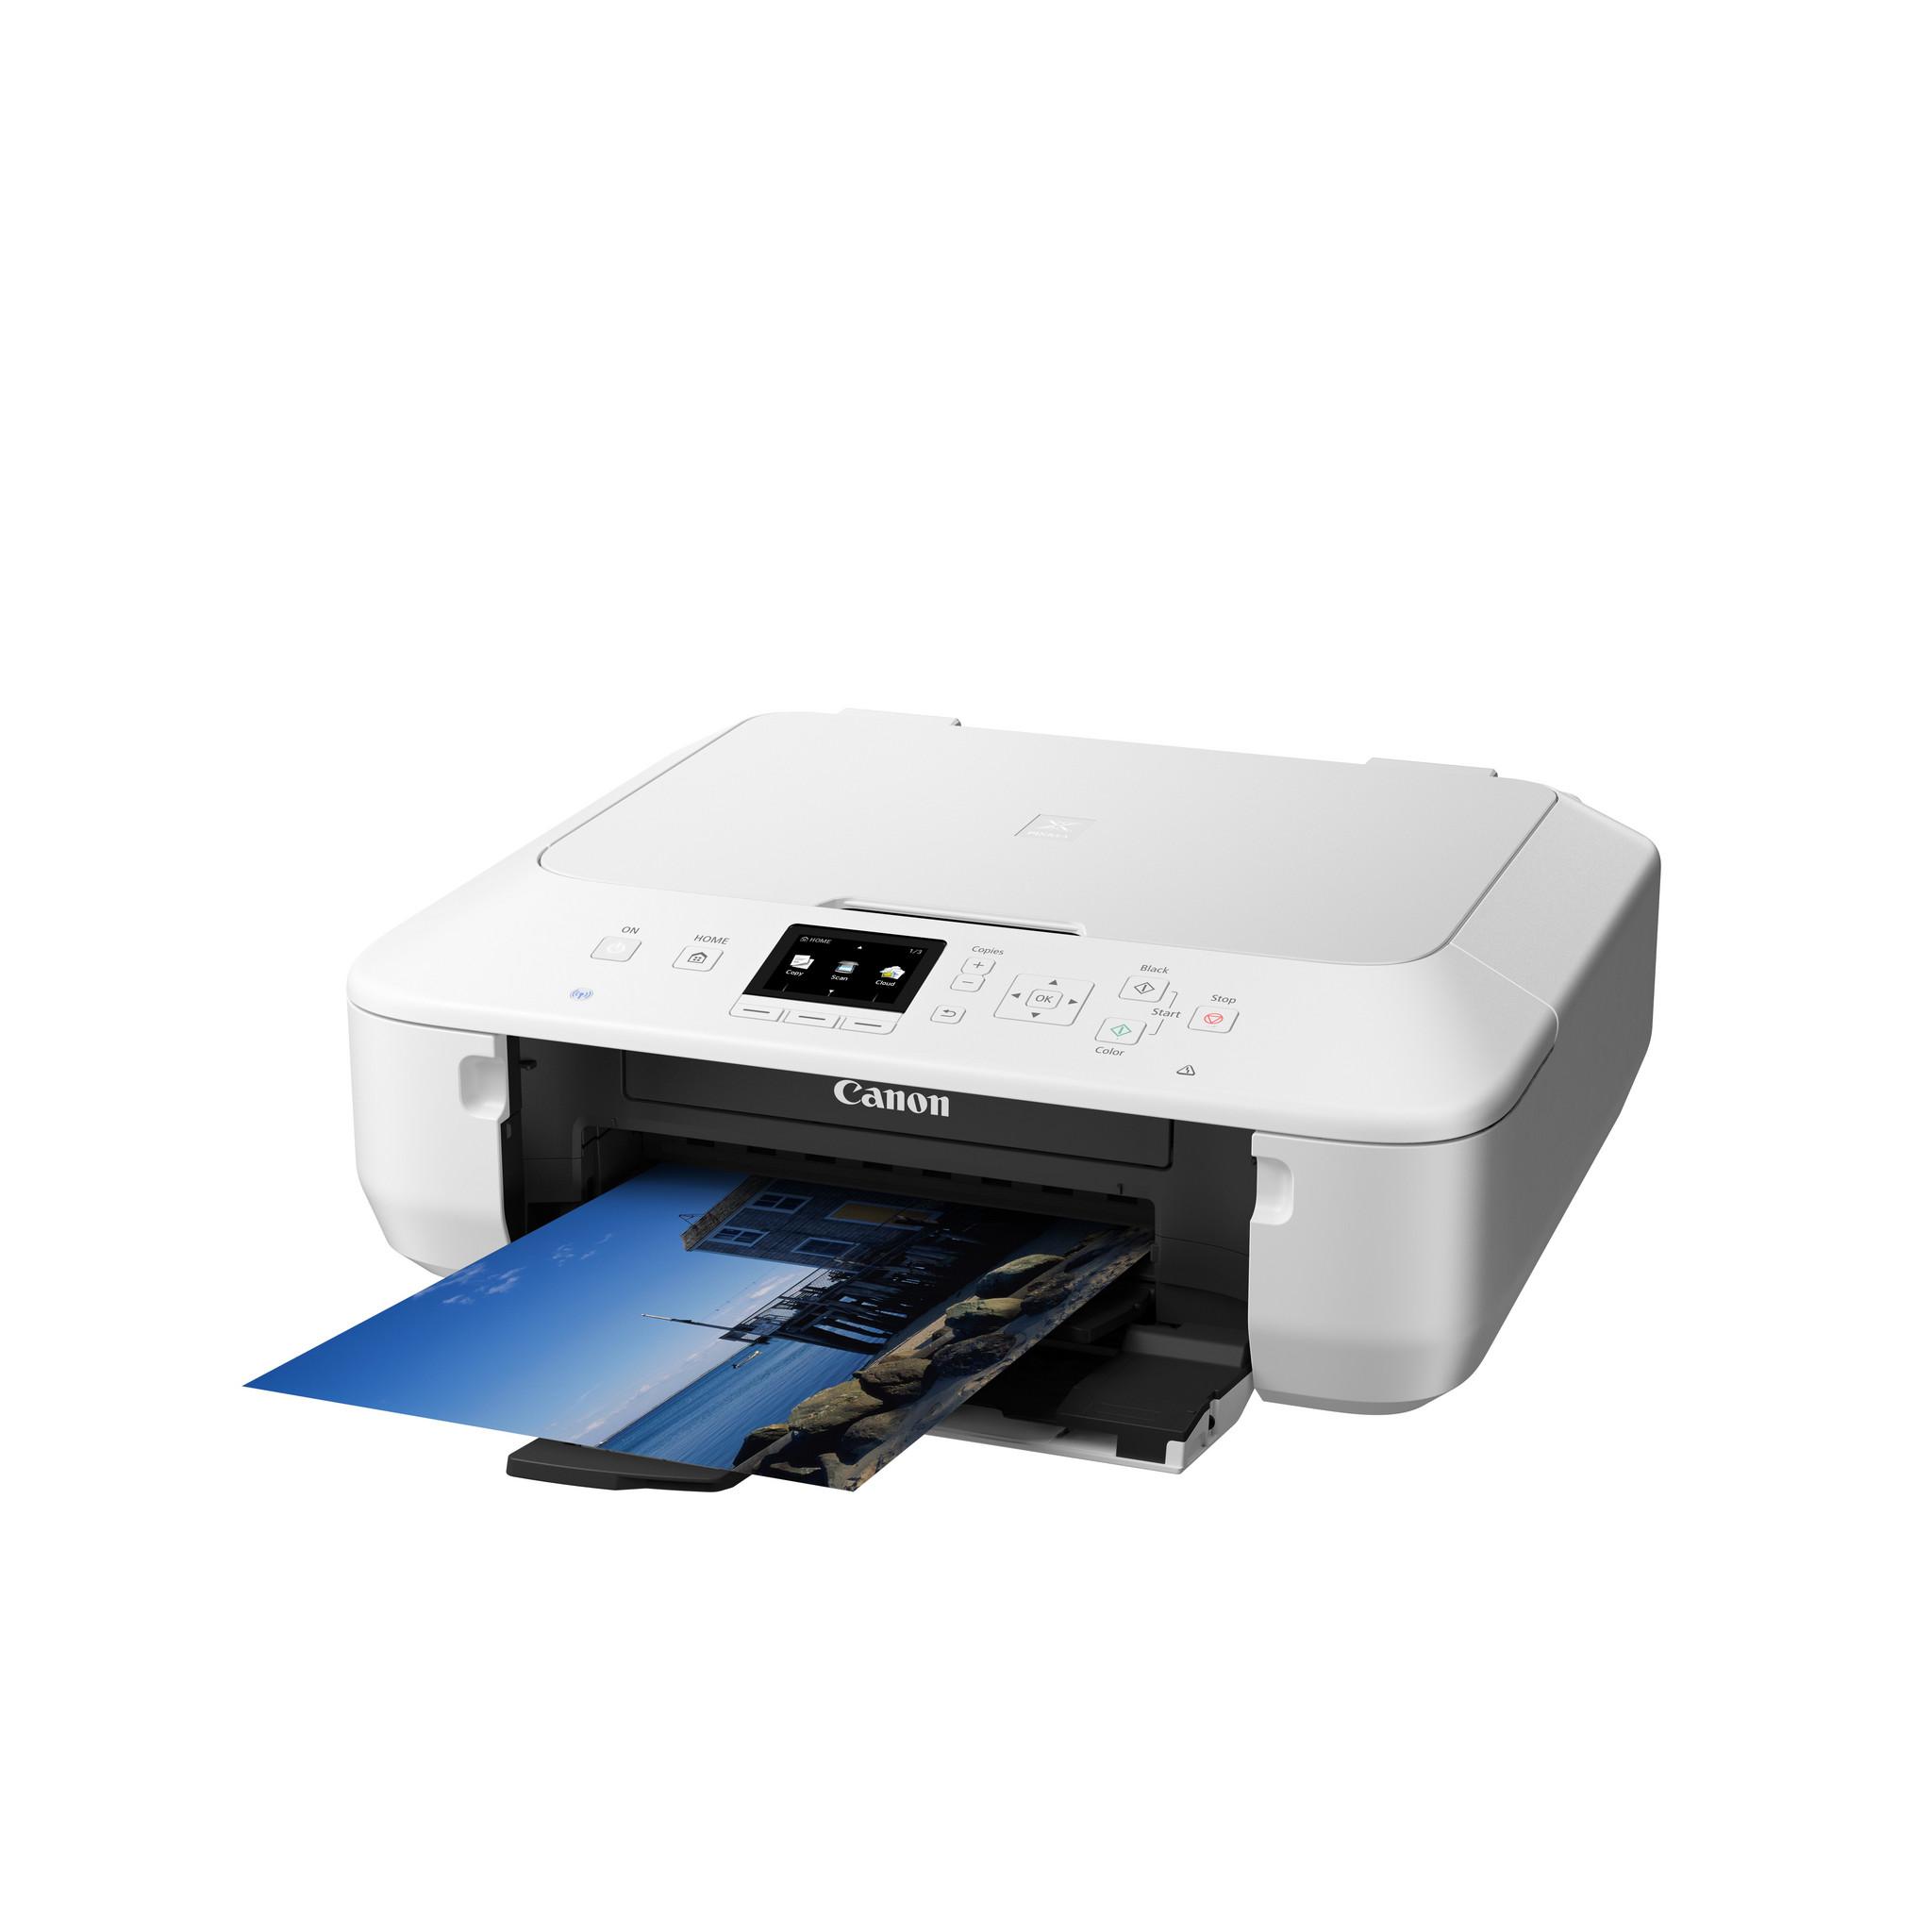 MG5650 EUR WHT FSL paper tray.jpg